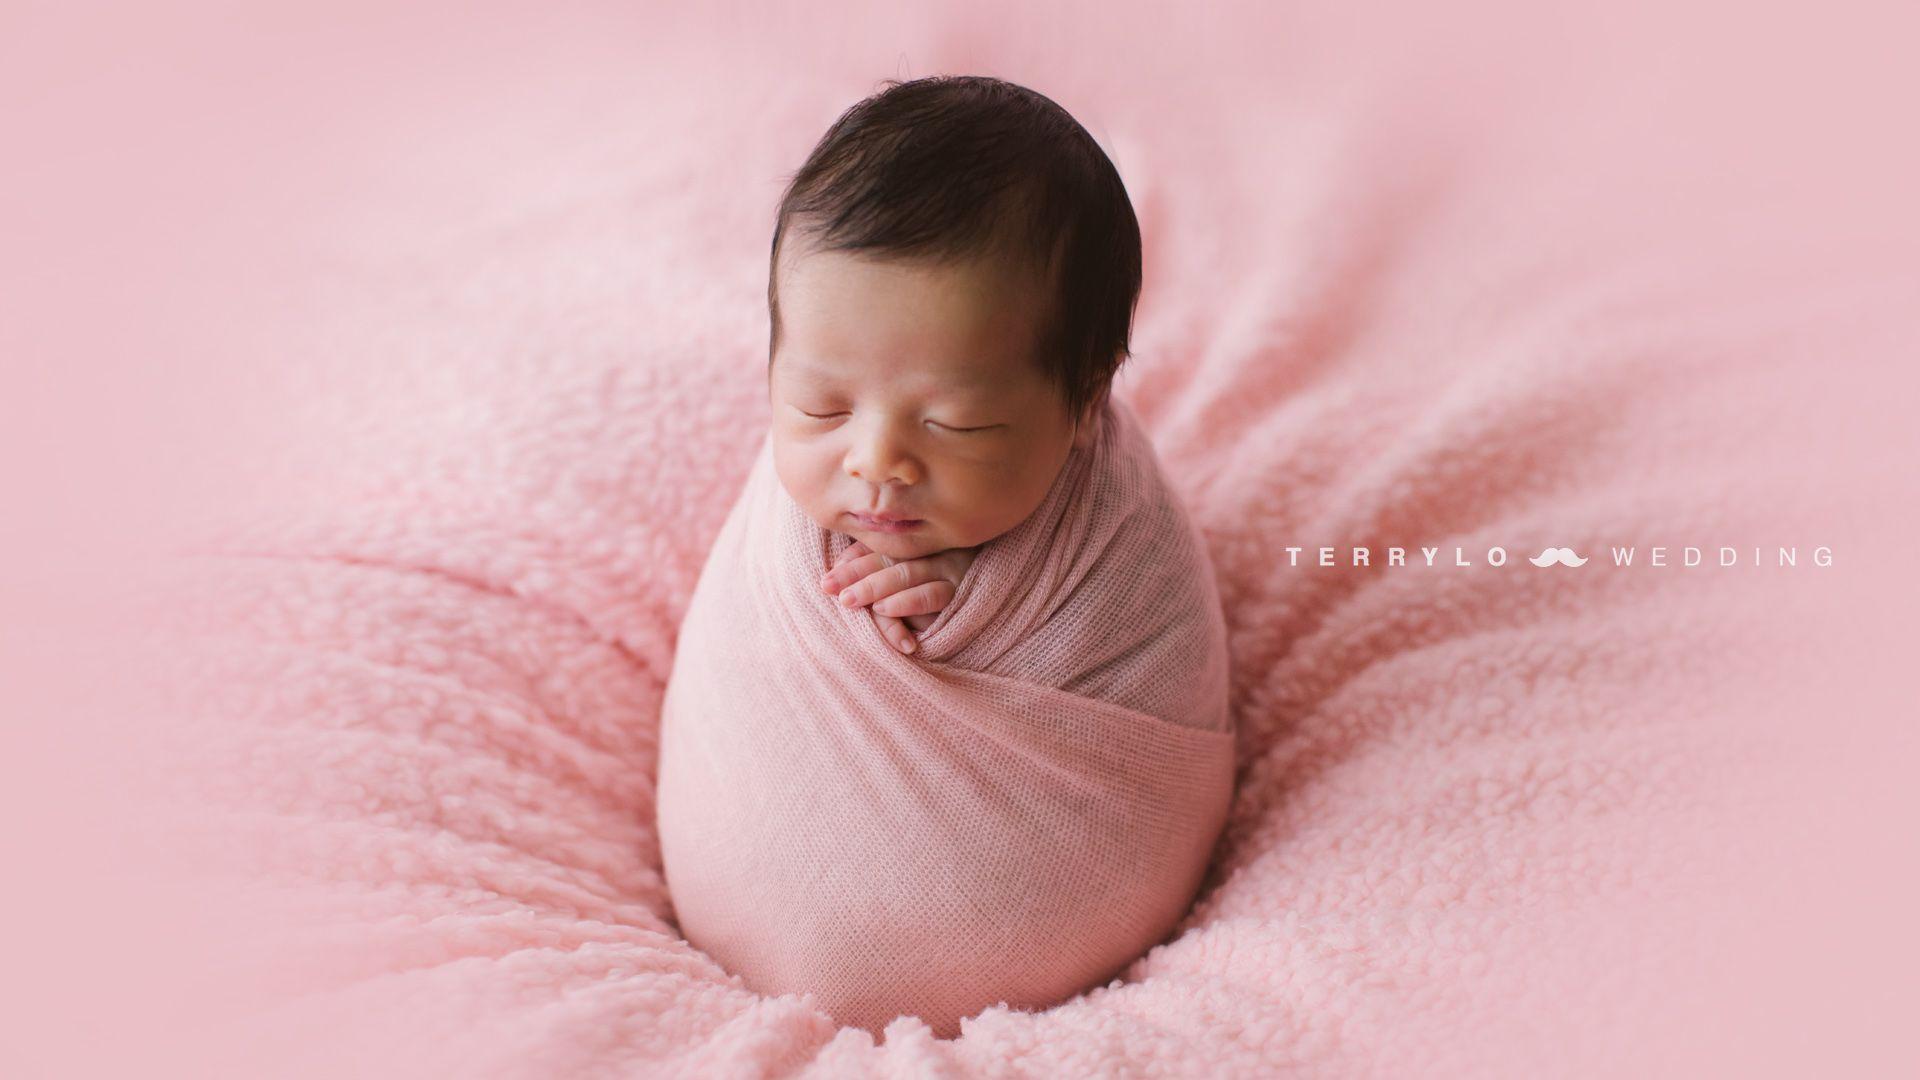 Newborn newbornhk hong kong hk photographer newborn photography family portrait baby maternity